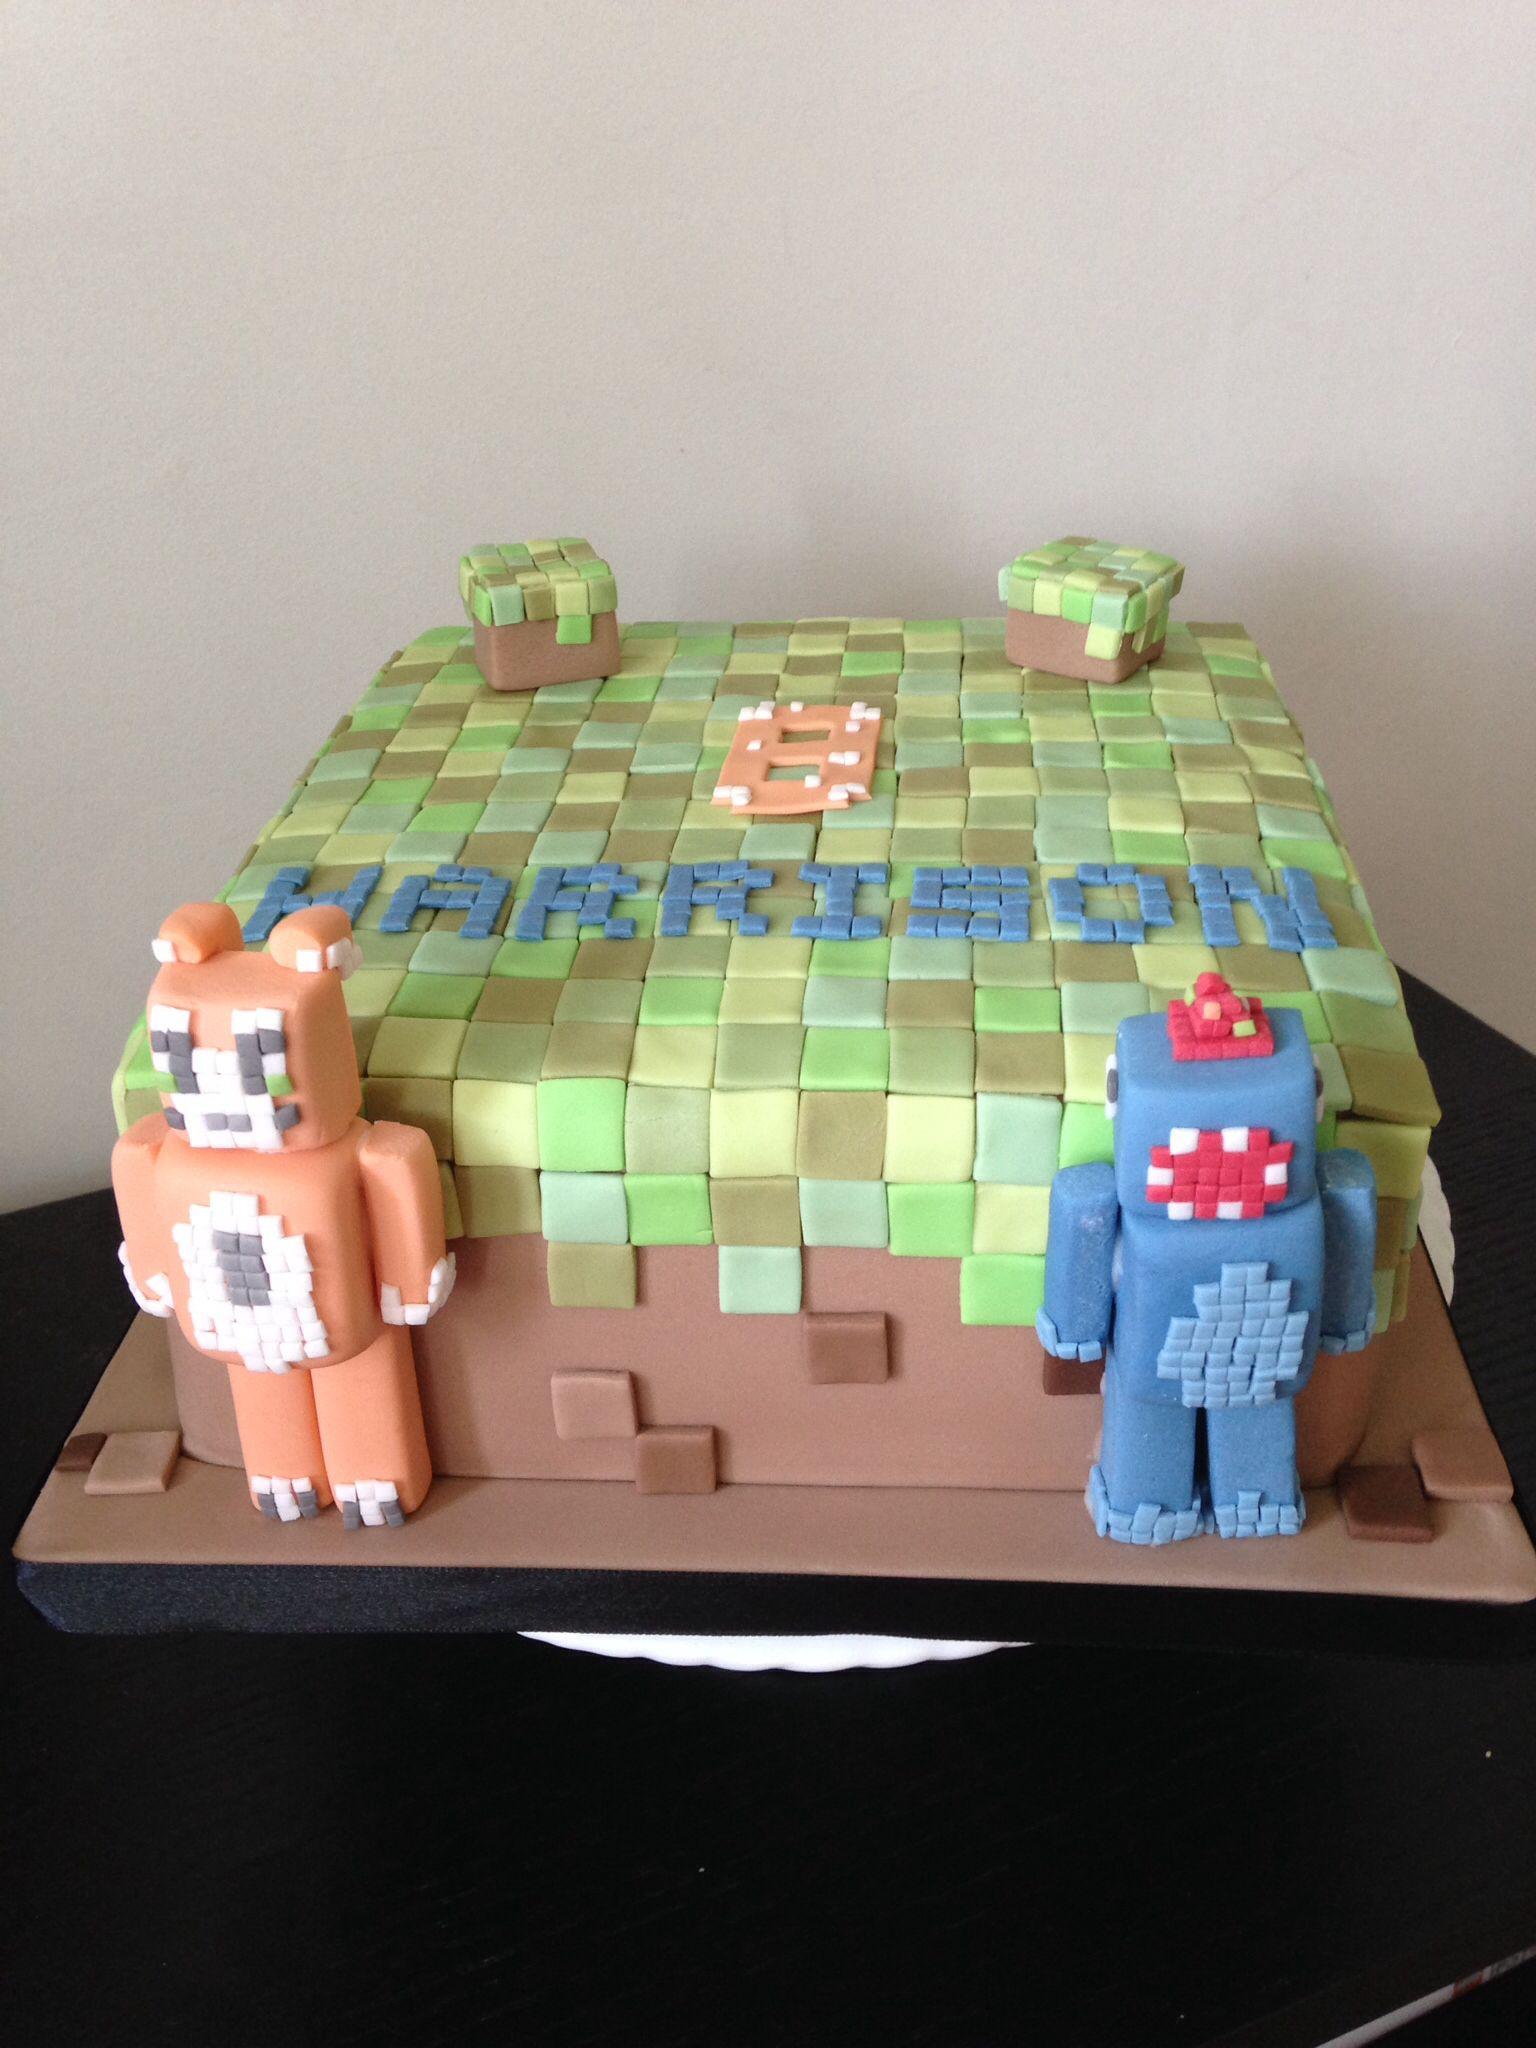 Minecraft Birthday Cake With Stampylongnose And Ballistic Squid